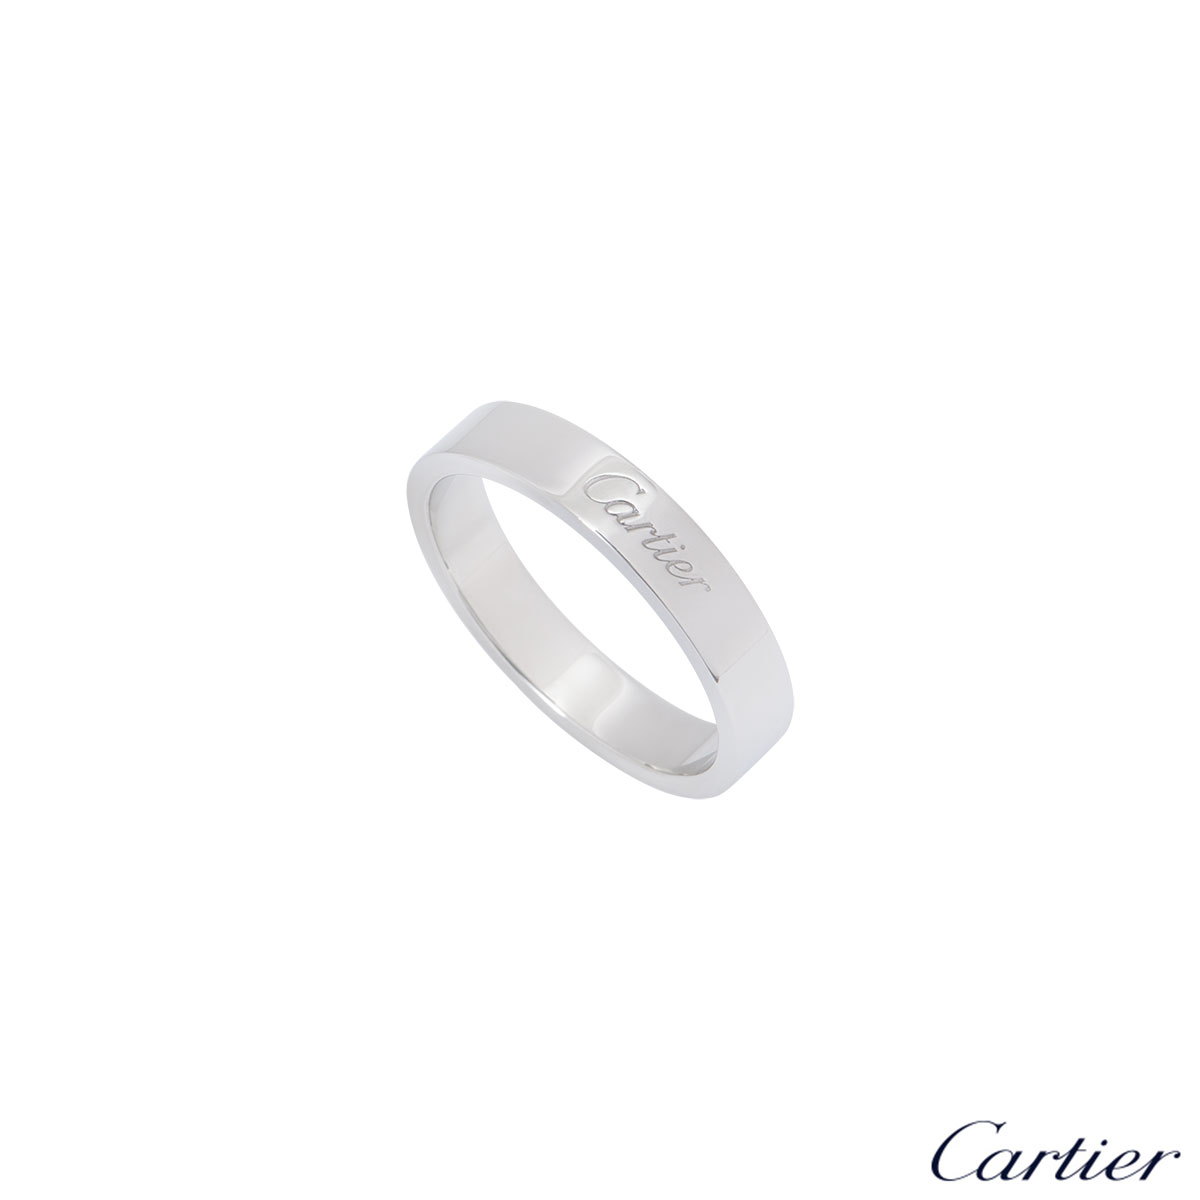 884cfd8a078aa Cartier C De Cartier Ring